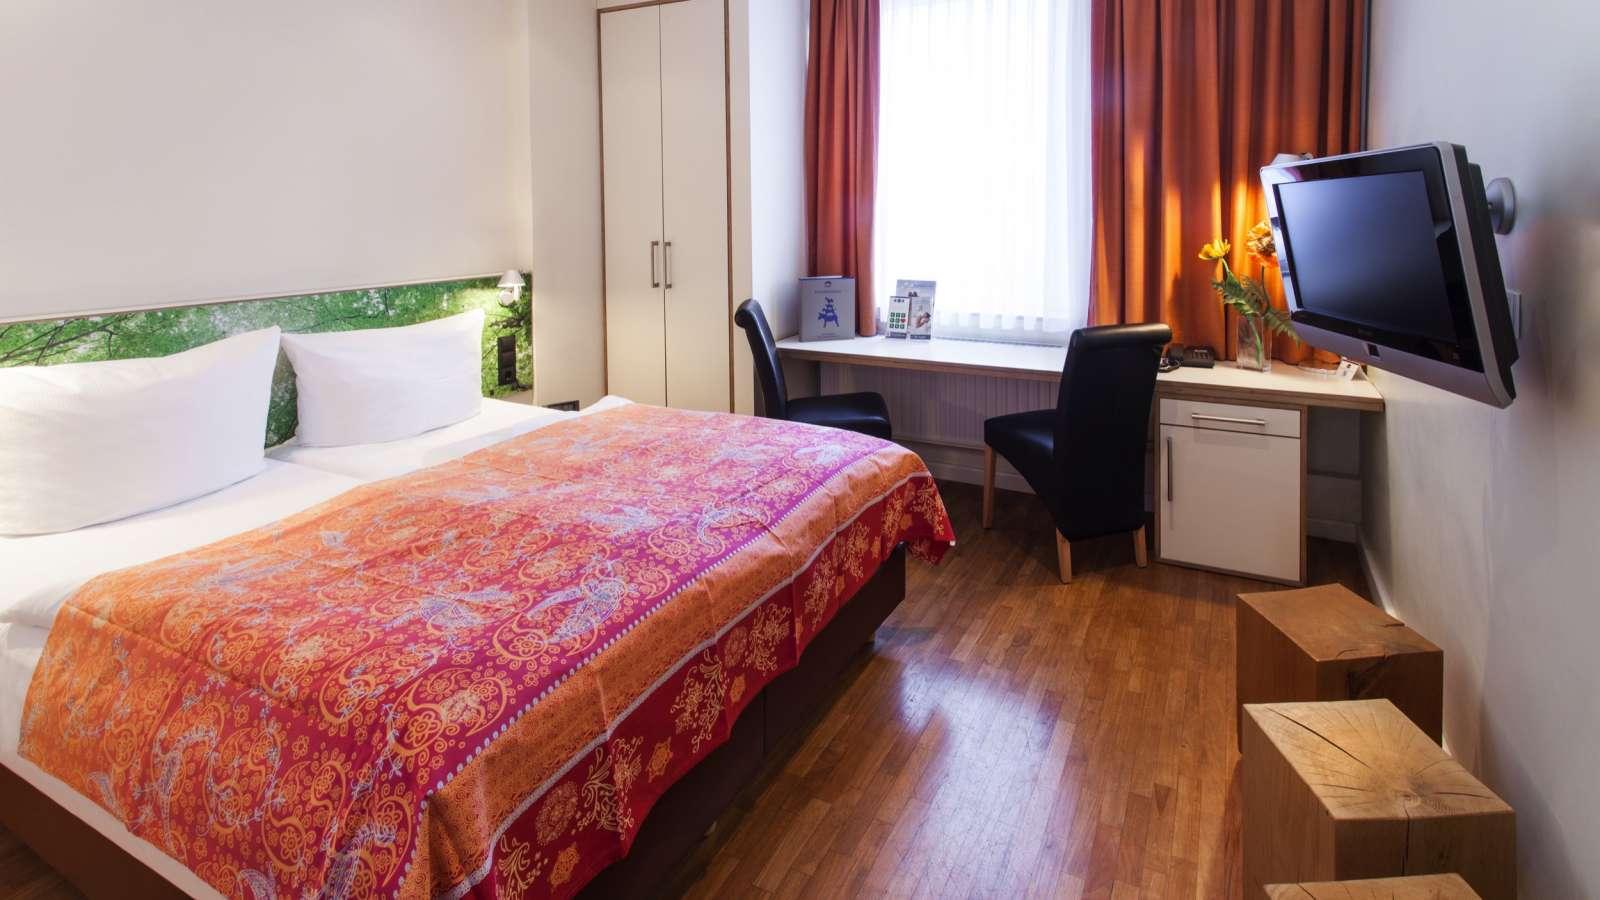 Best western hotel bremen city for Hotel bremen bielefeld